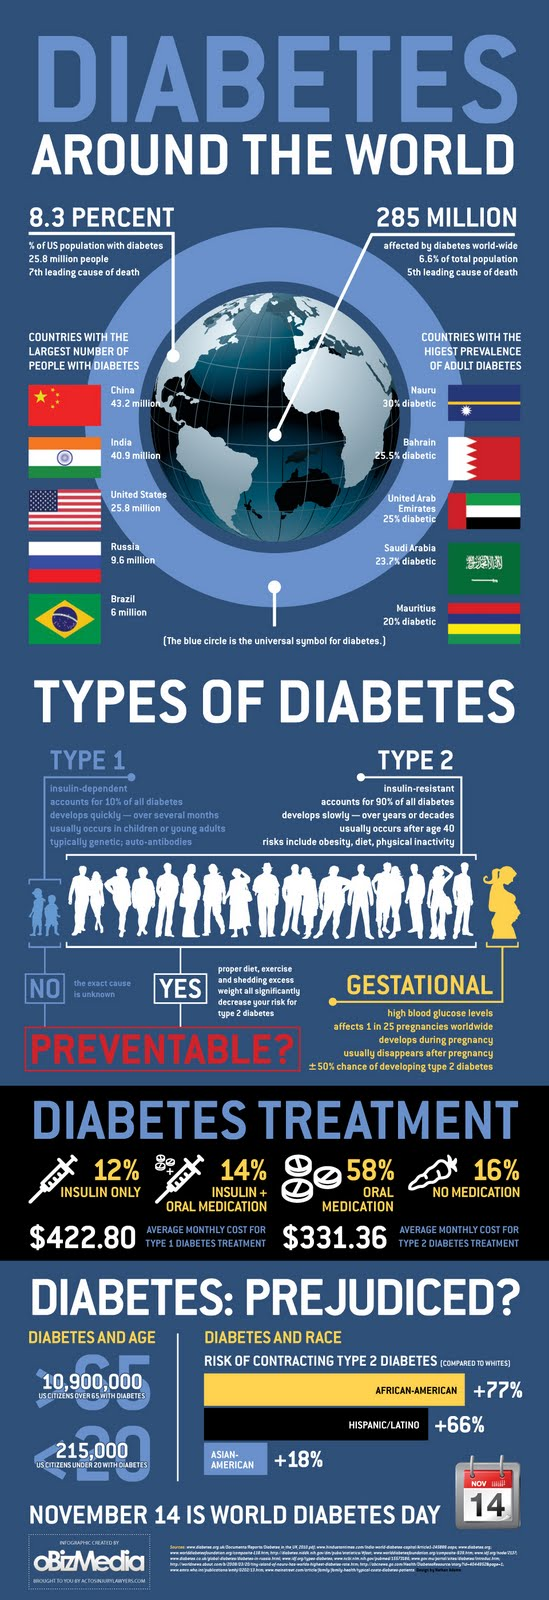 Diabetes Rates Worldwide